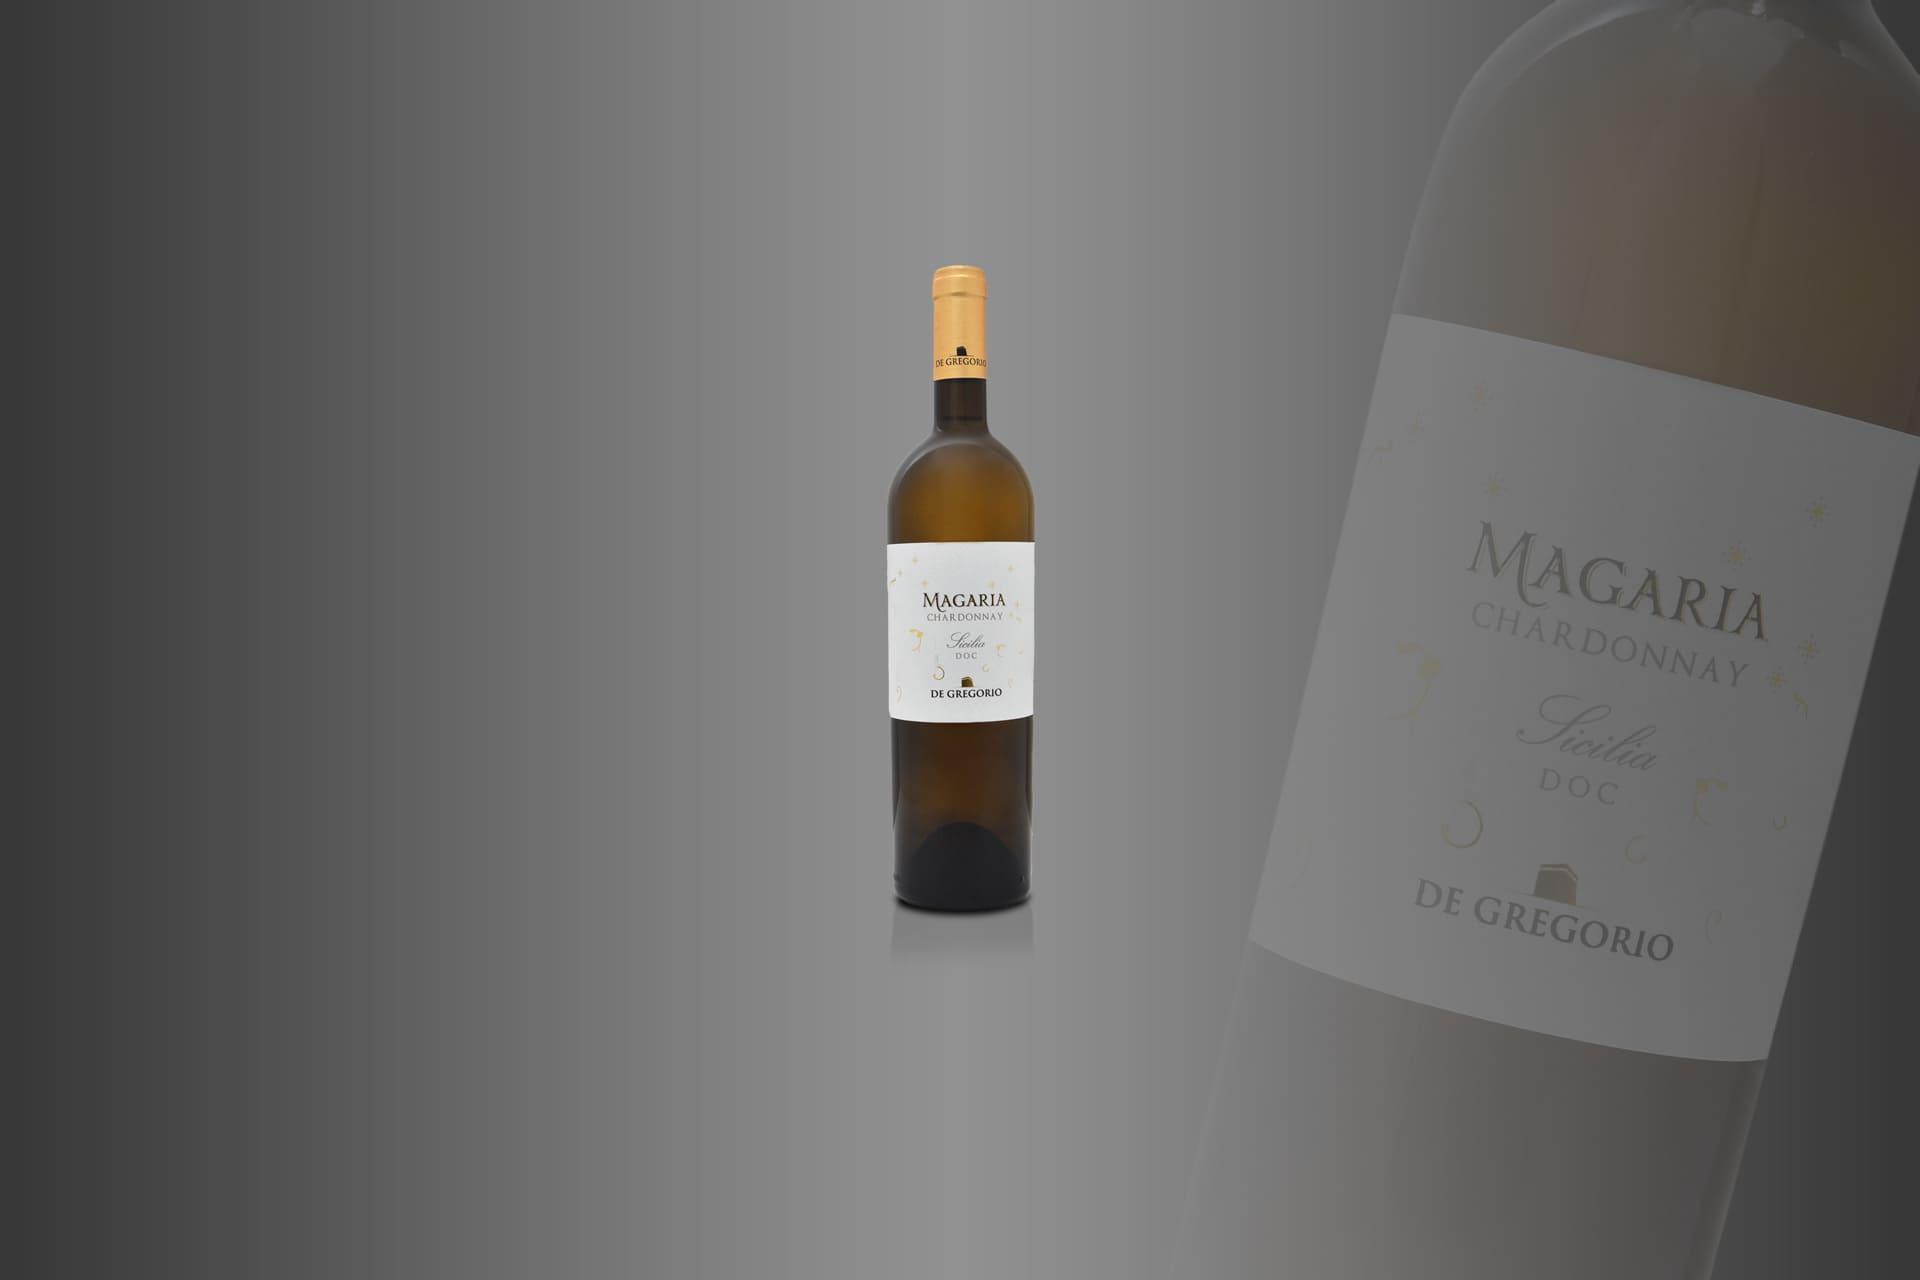 Magaria Chardonnay D.O.C. Sicilia